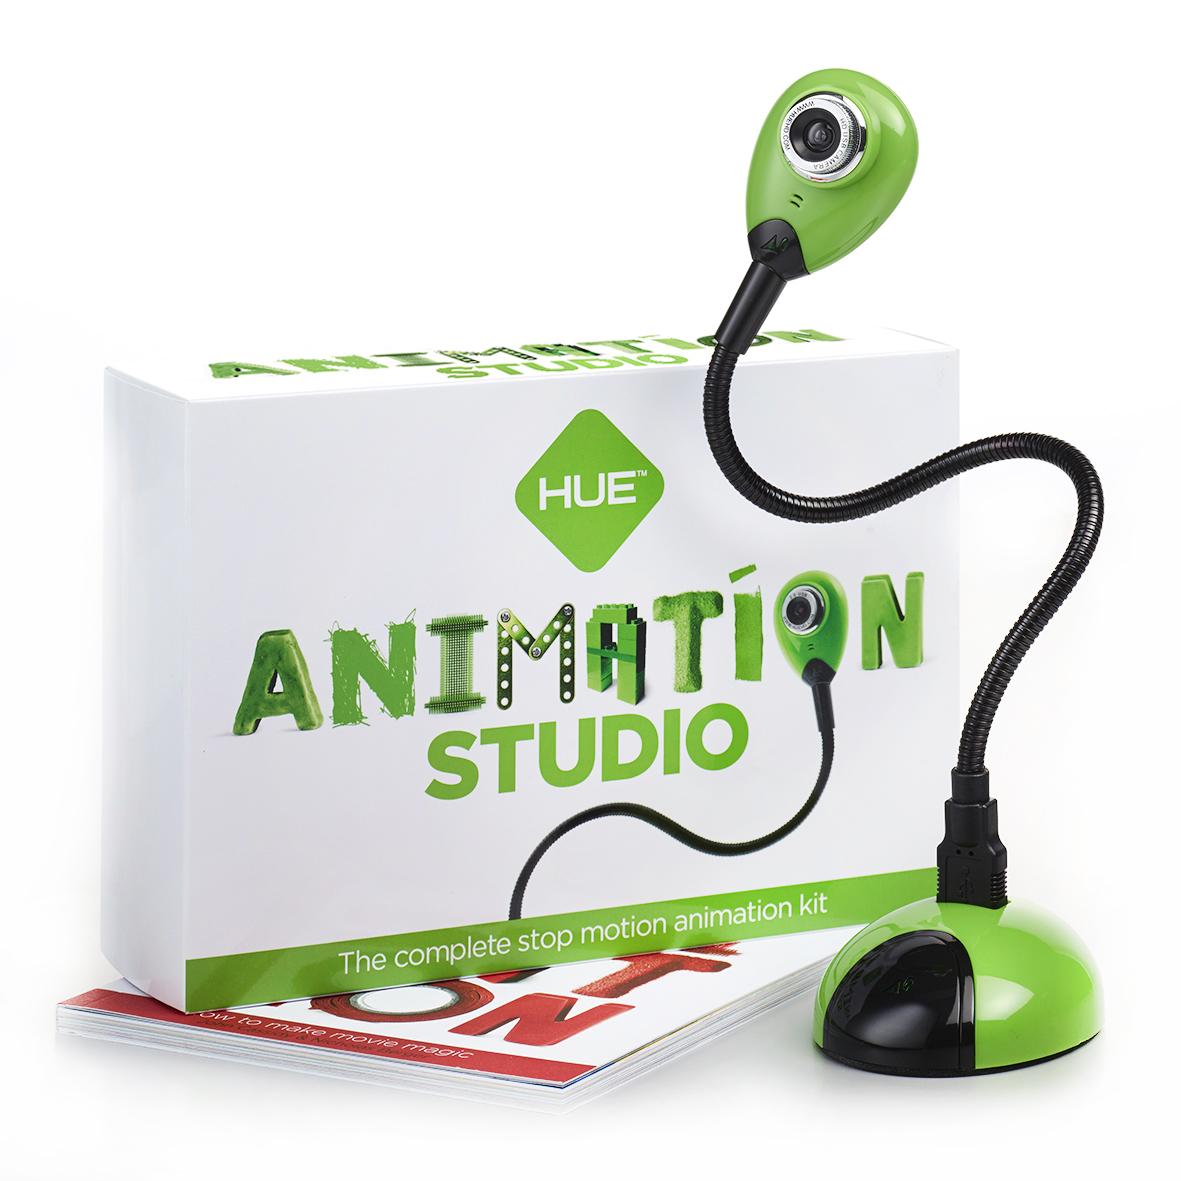 HUE Animation Studio with Bendy Camera